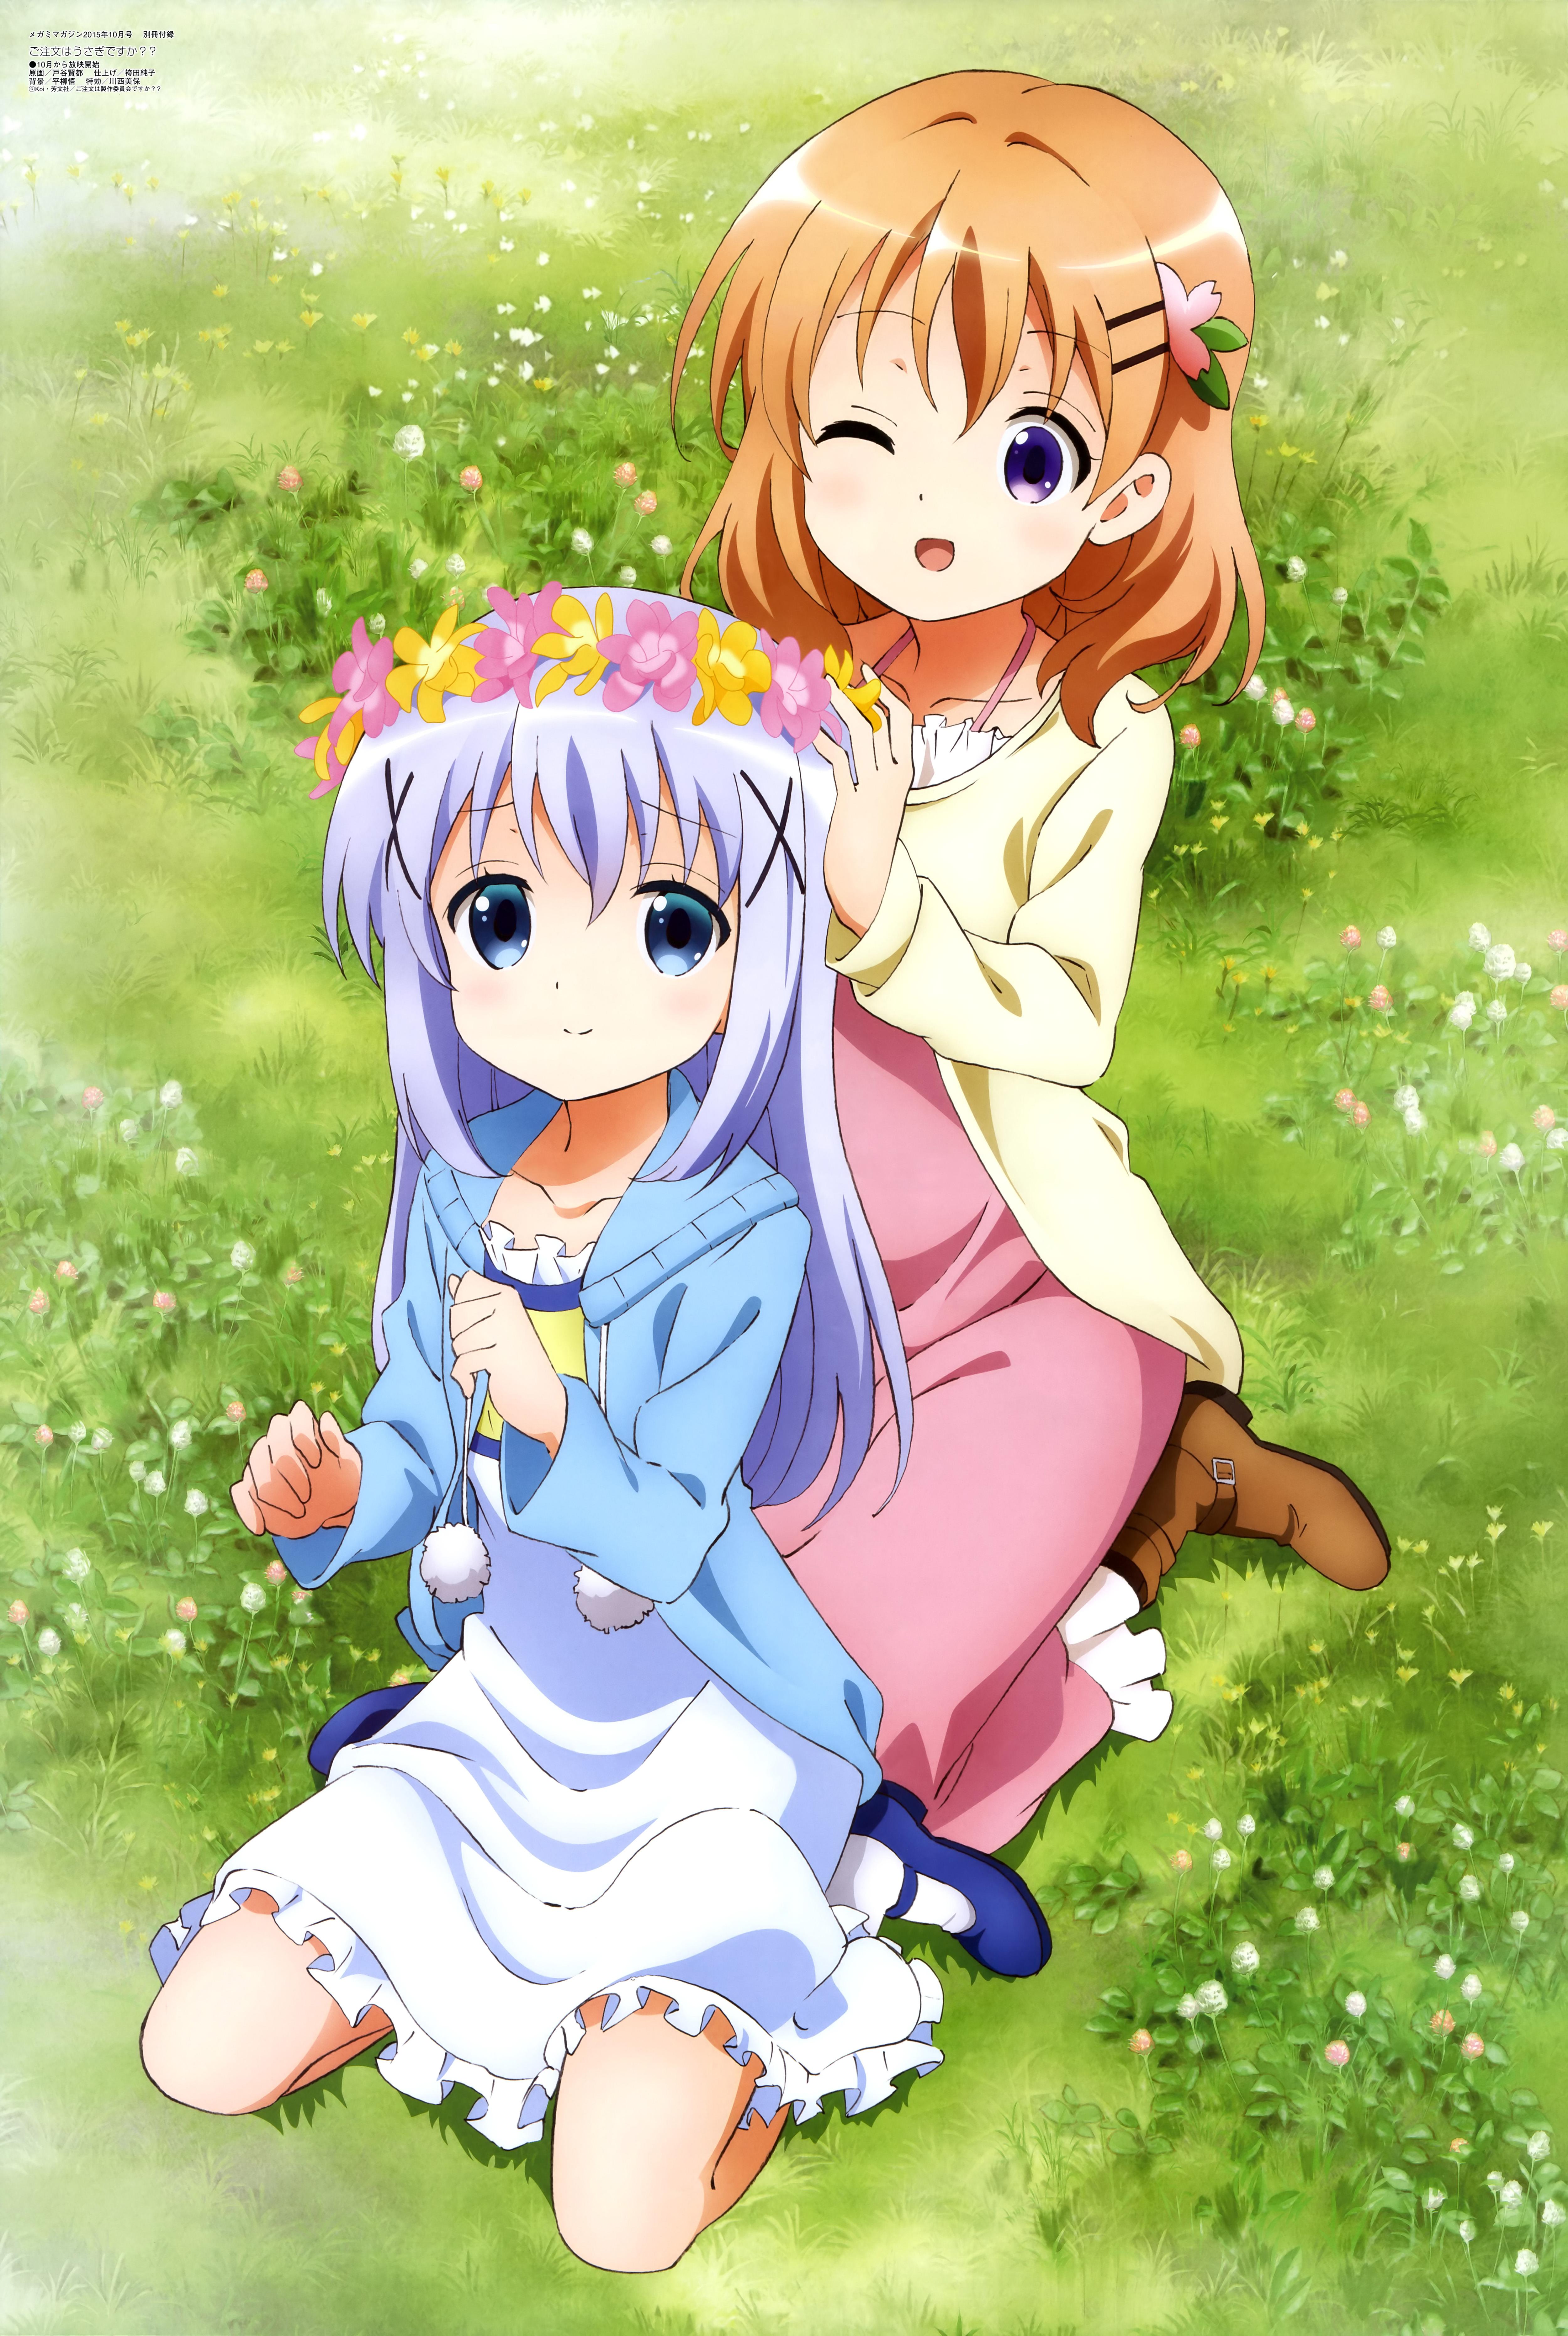 Megami-Magazine-October-anime-posters-gochuumon wa usagi desu ka